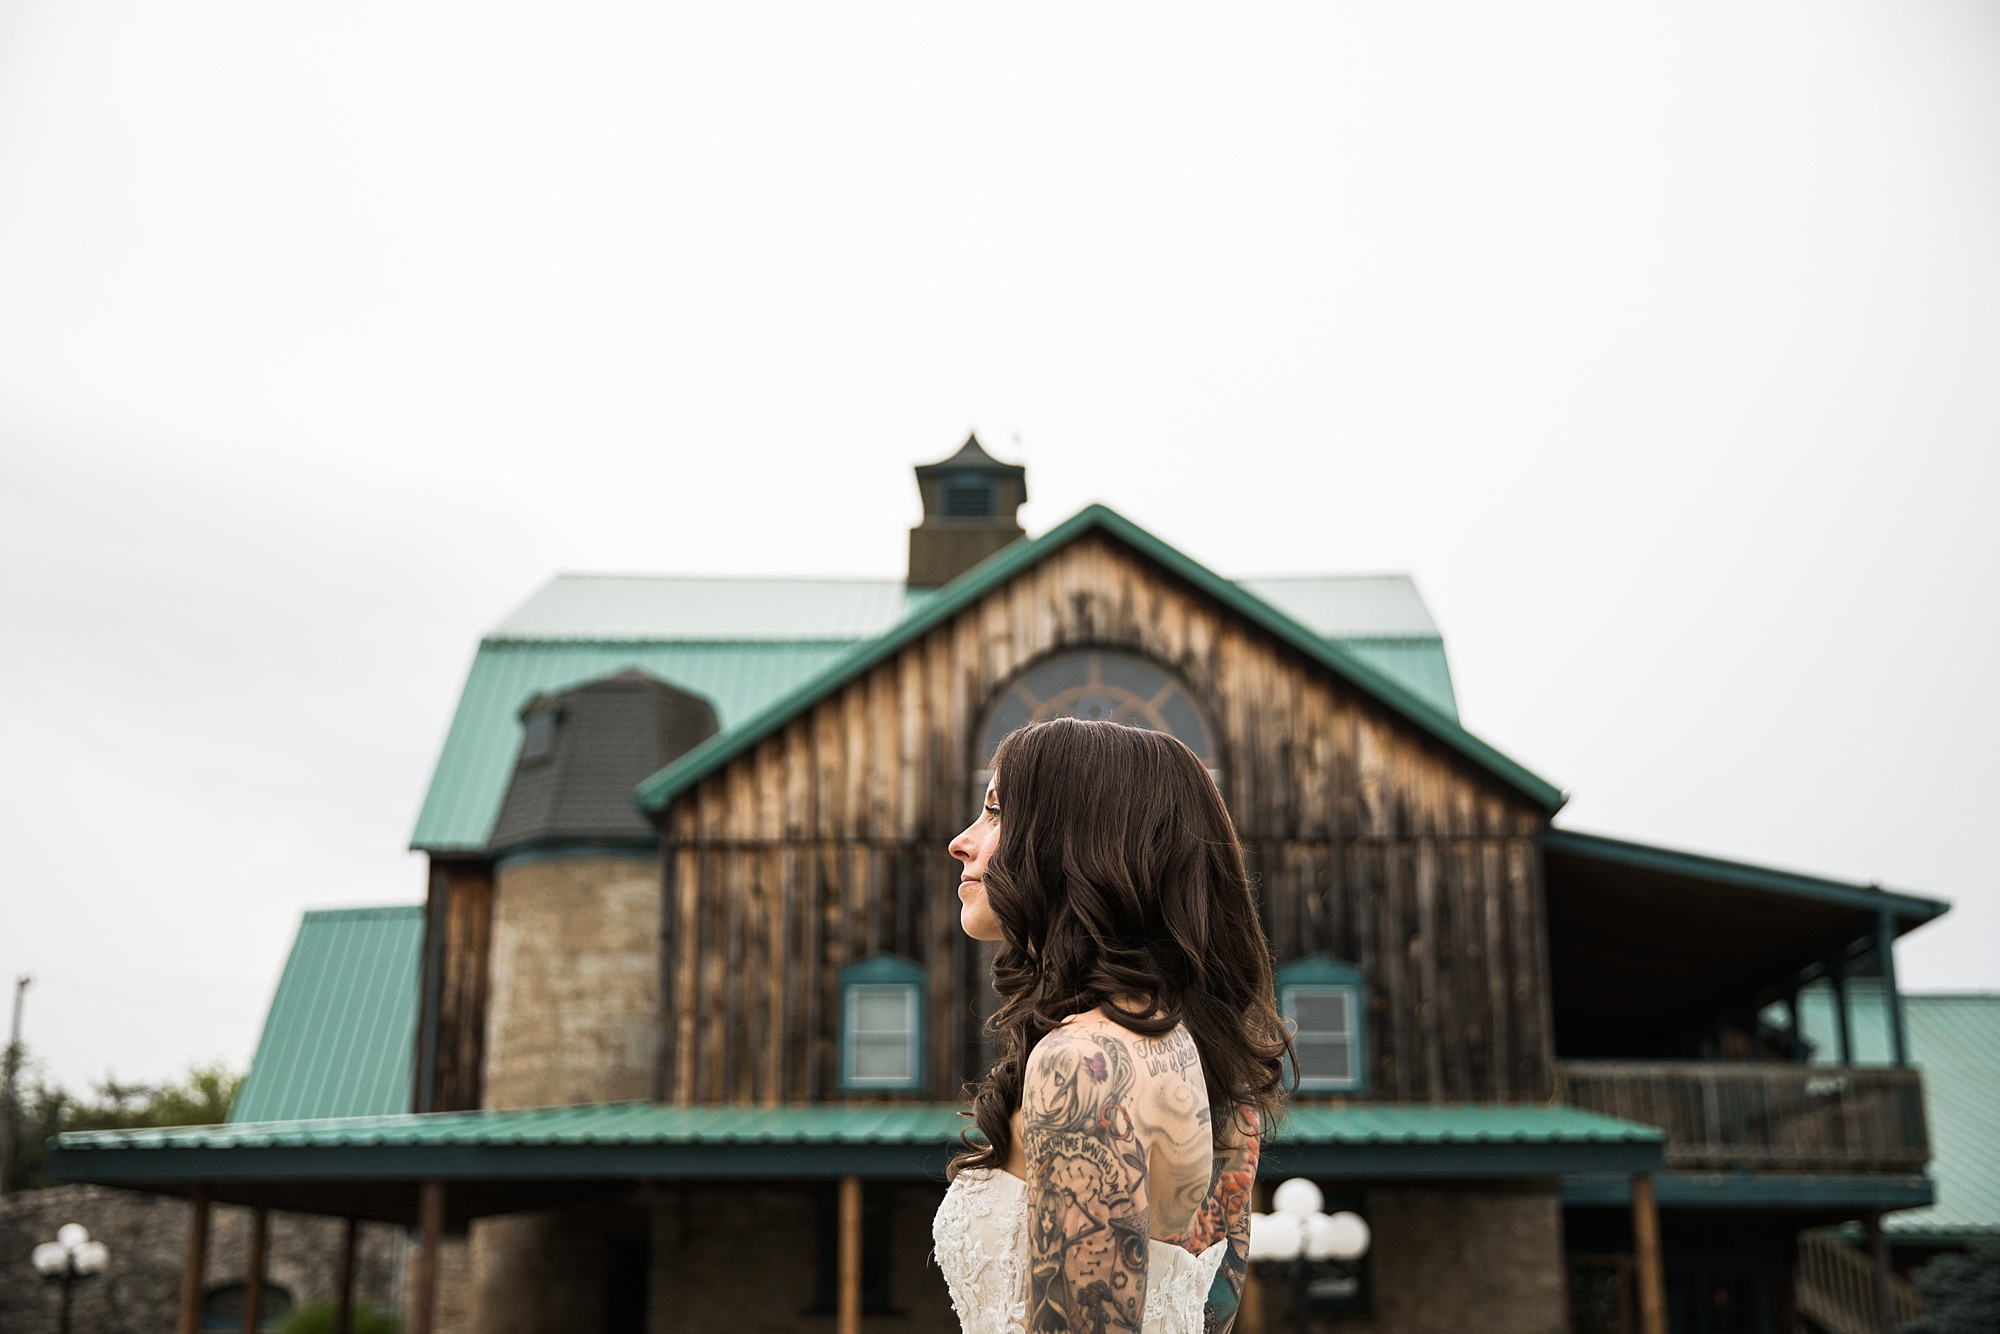 lipapark-hernderwinery-wedding_0038.jpg